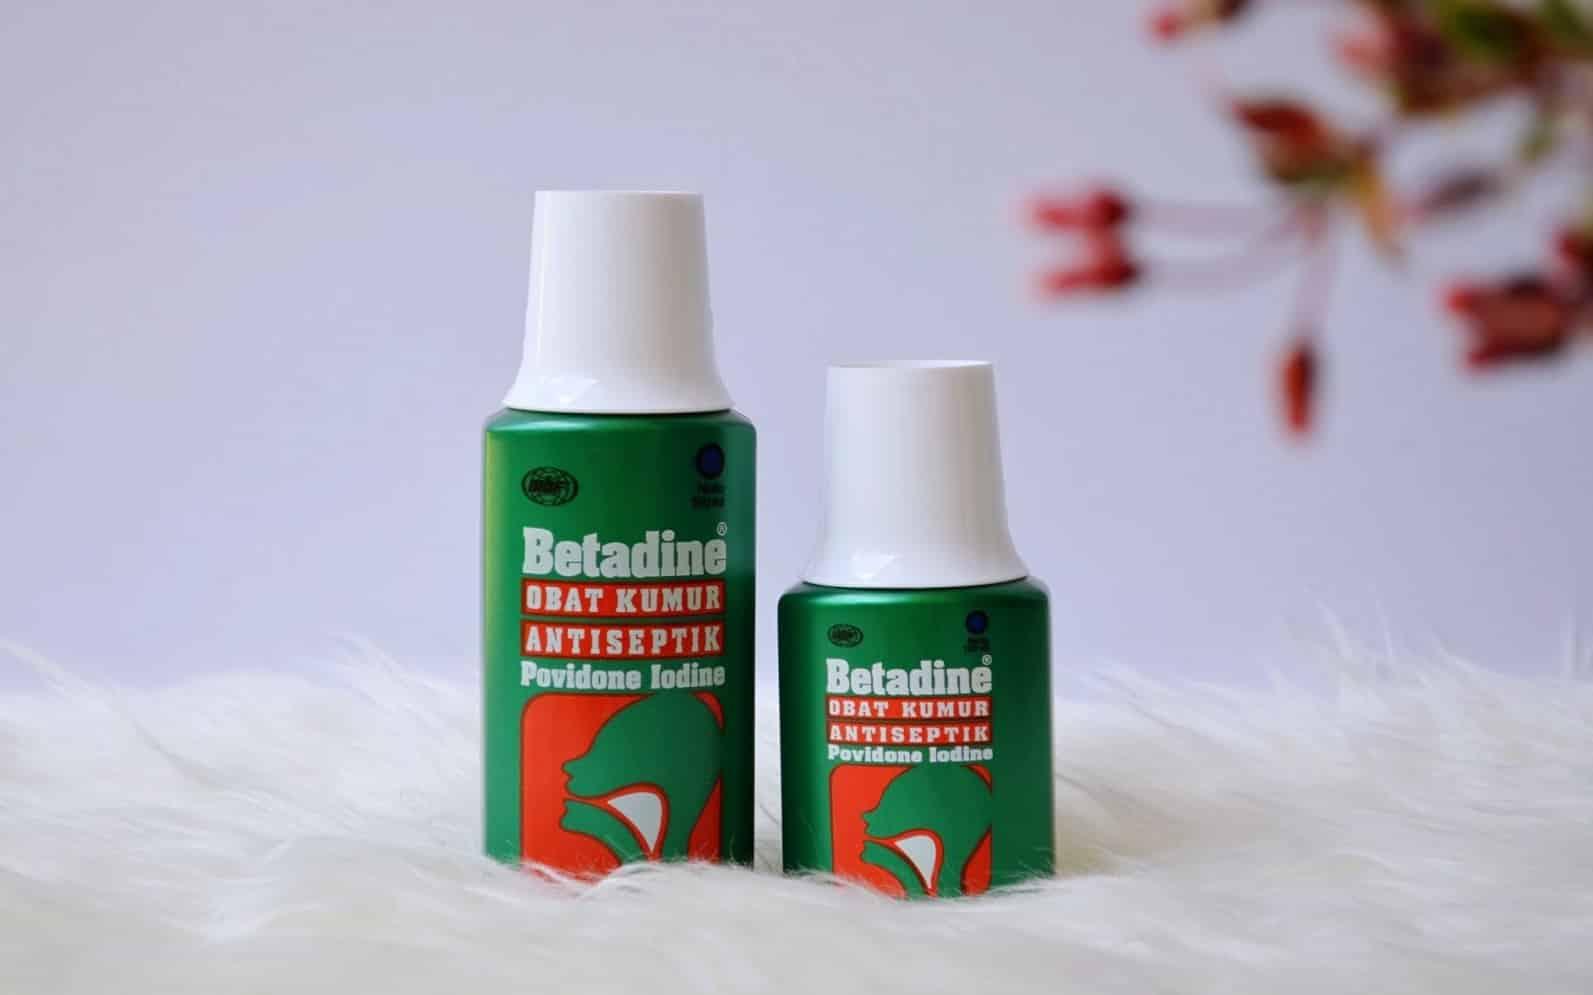 Betadine-Obat-Kumur